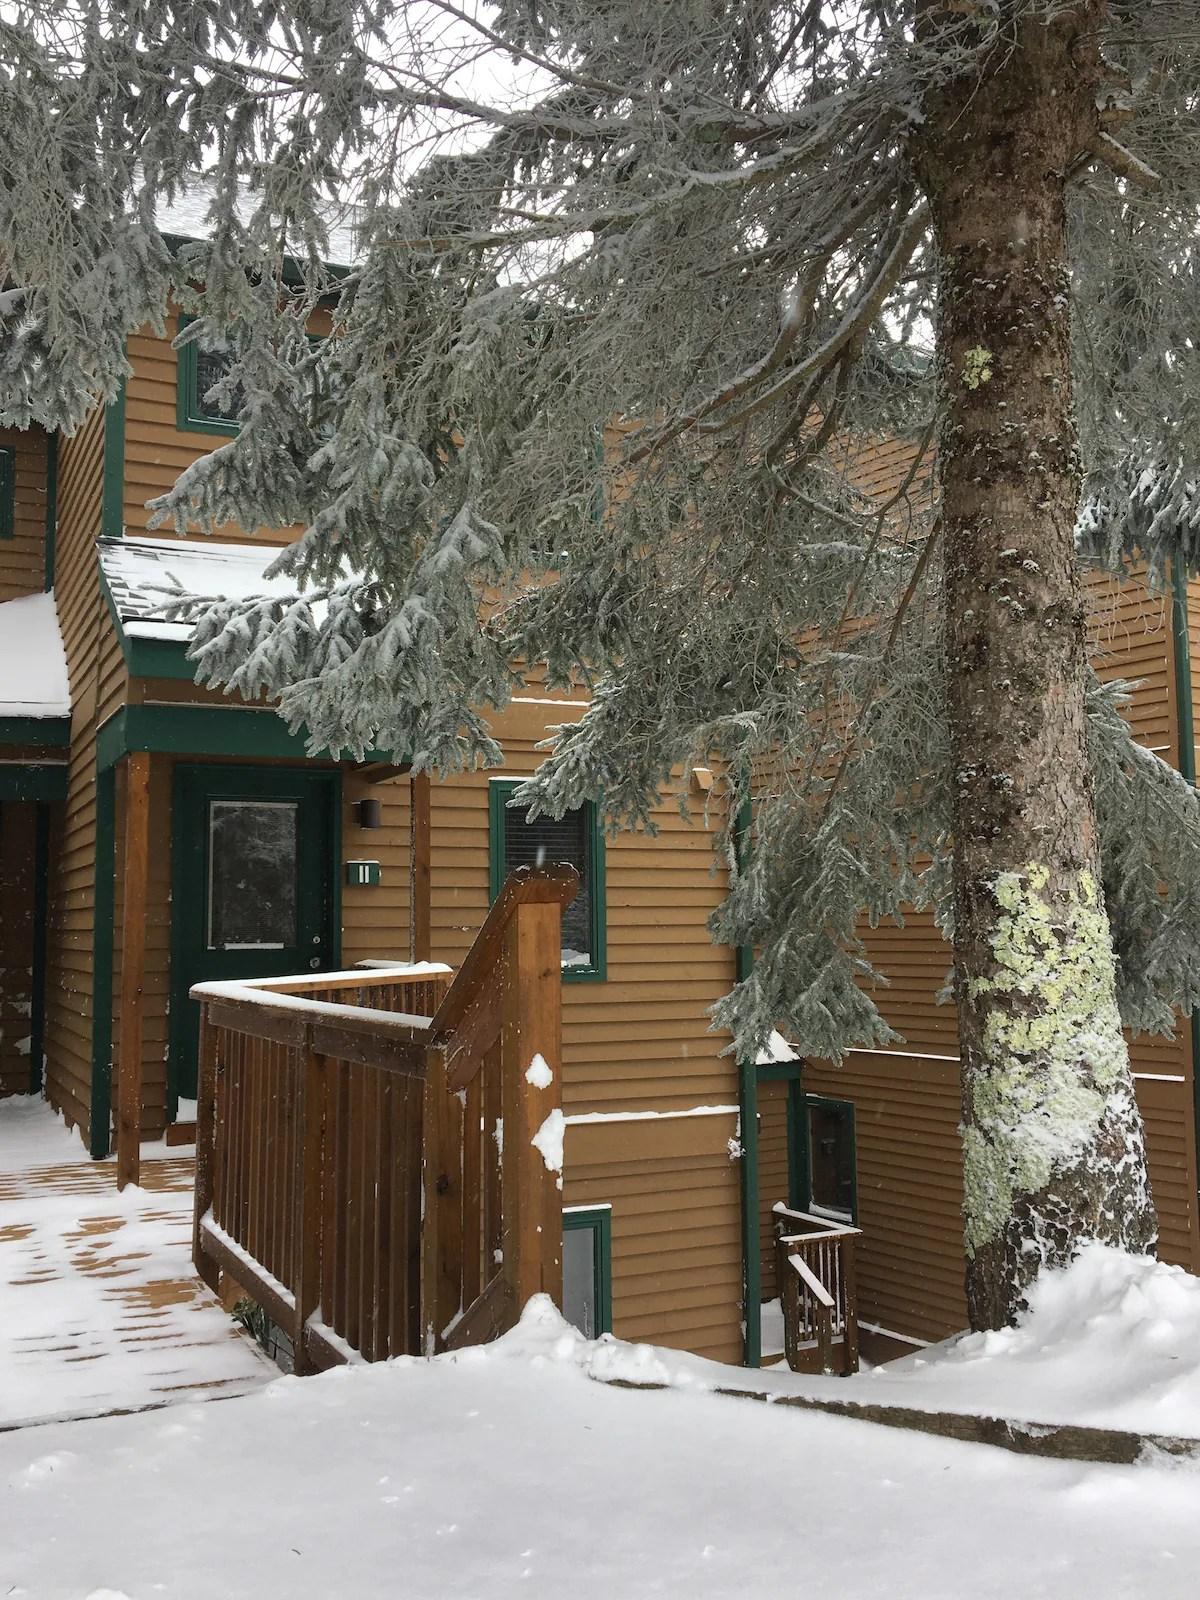 twin sleeper sofa rooms to go craigslist dallas bed 11 powderidge, snowshoe, wv - condominiums for rent in ...